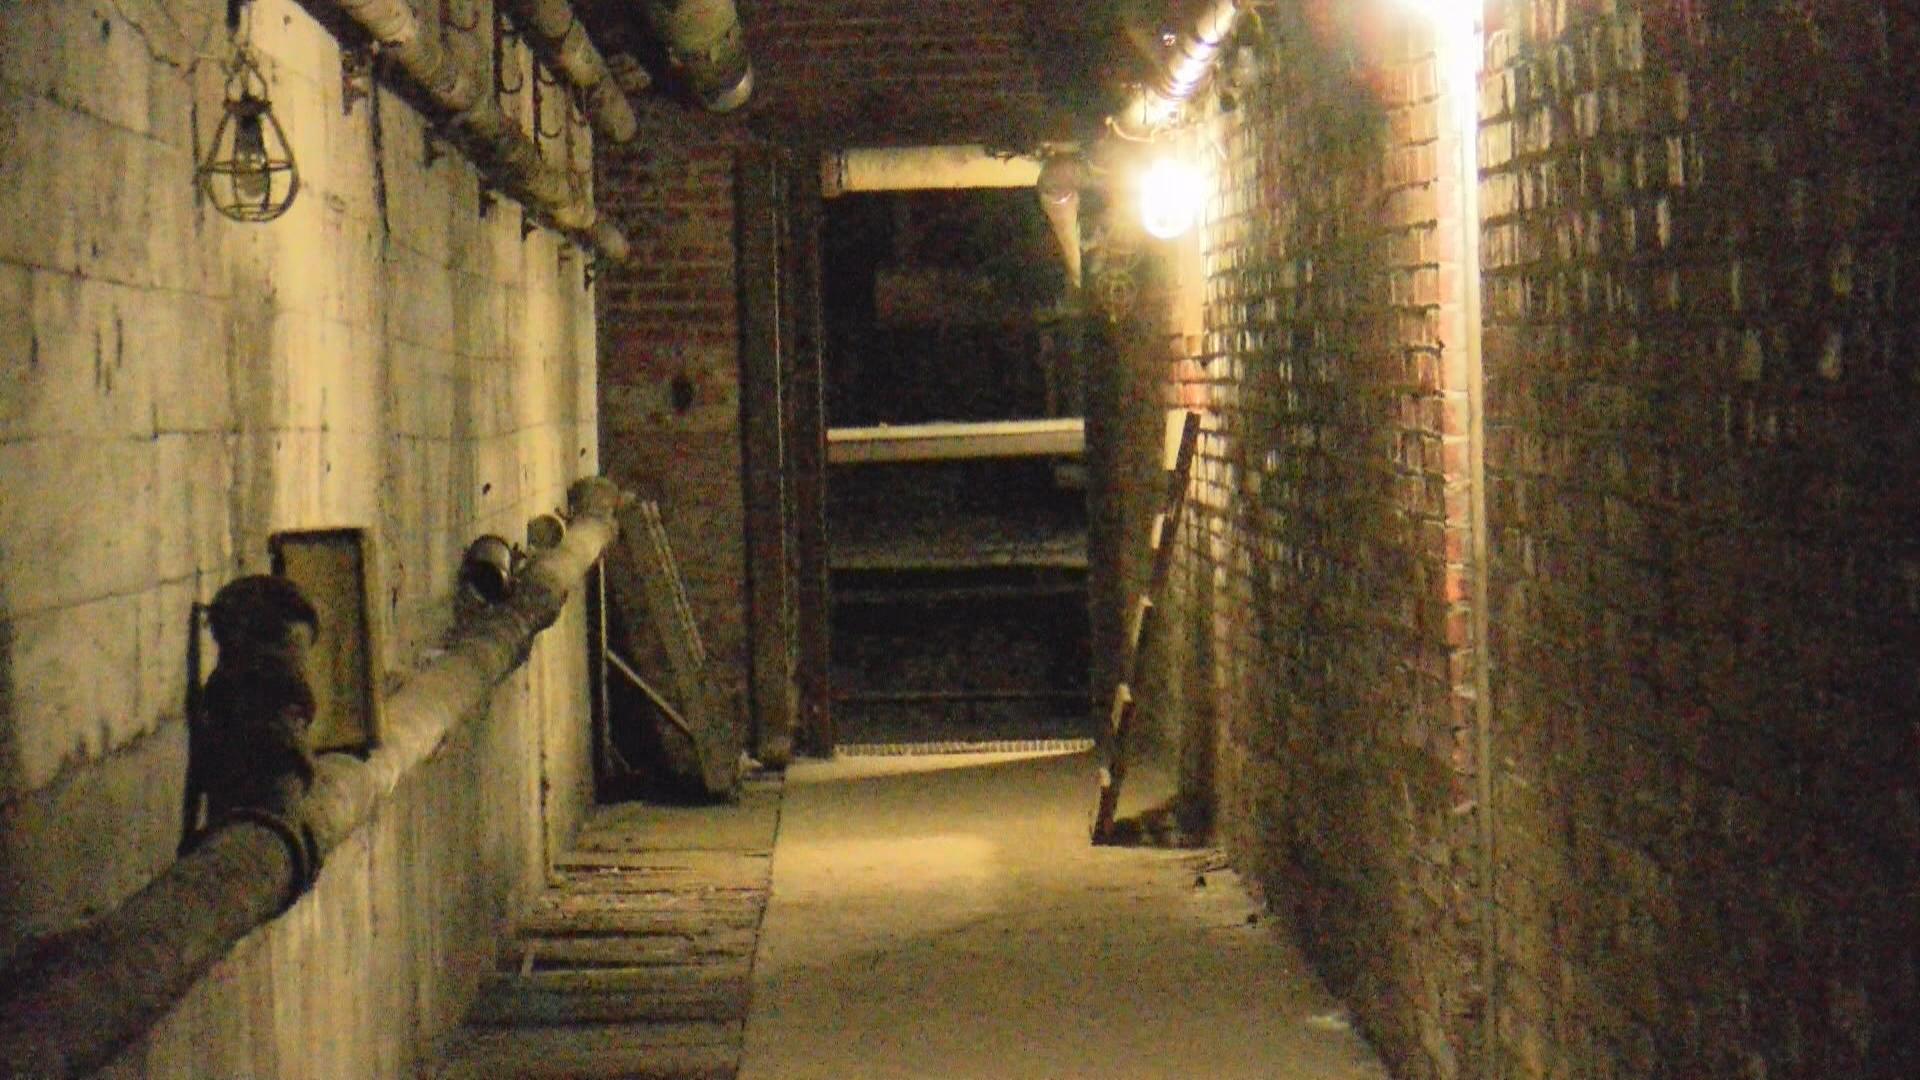 tunnels_1508017315954.jpg